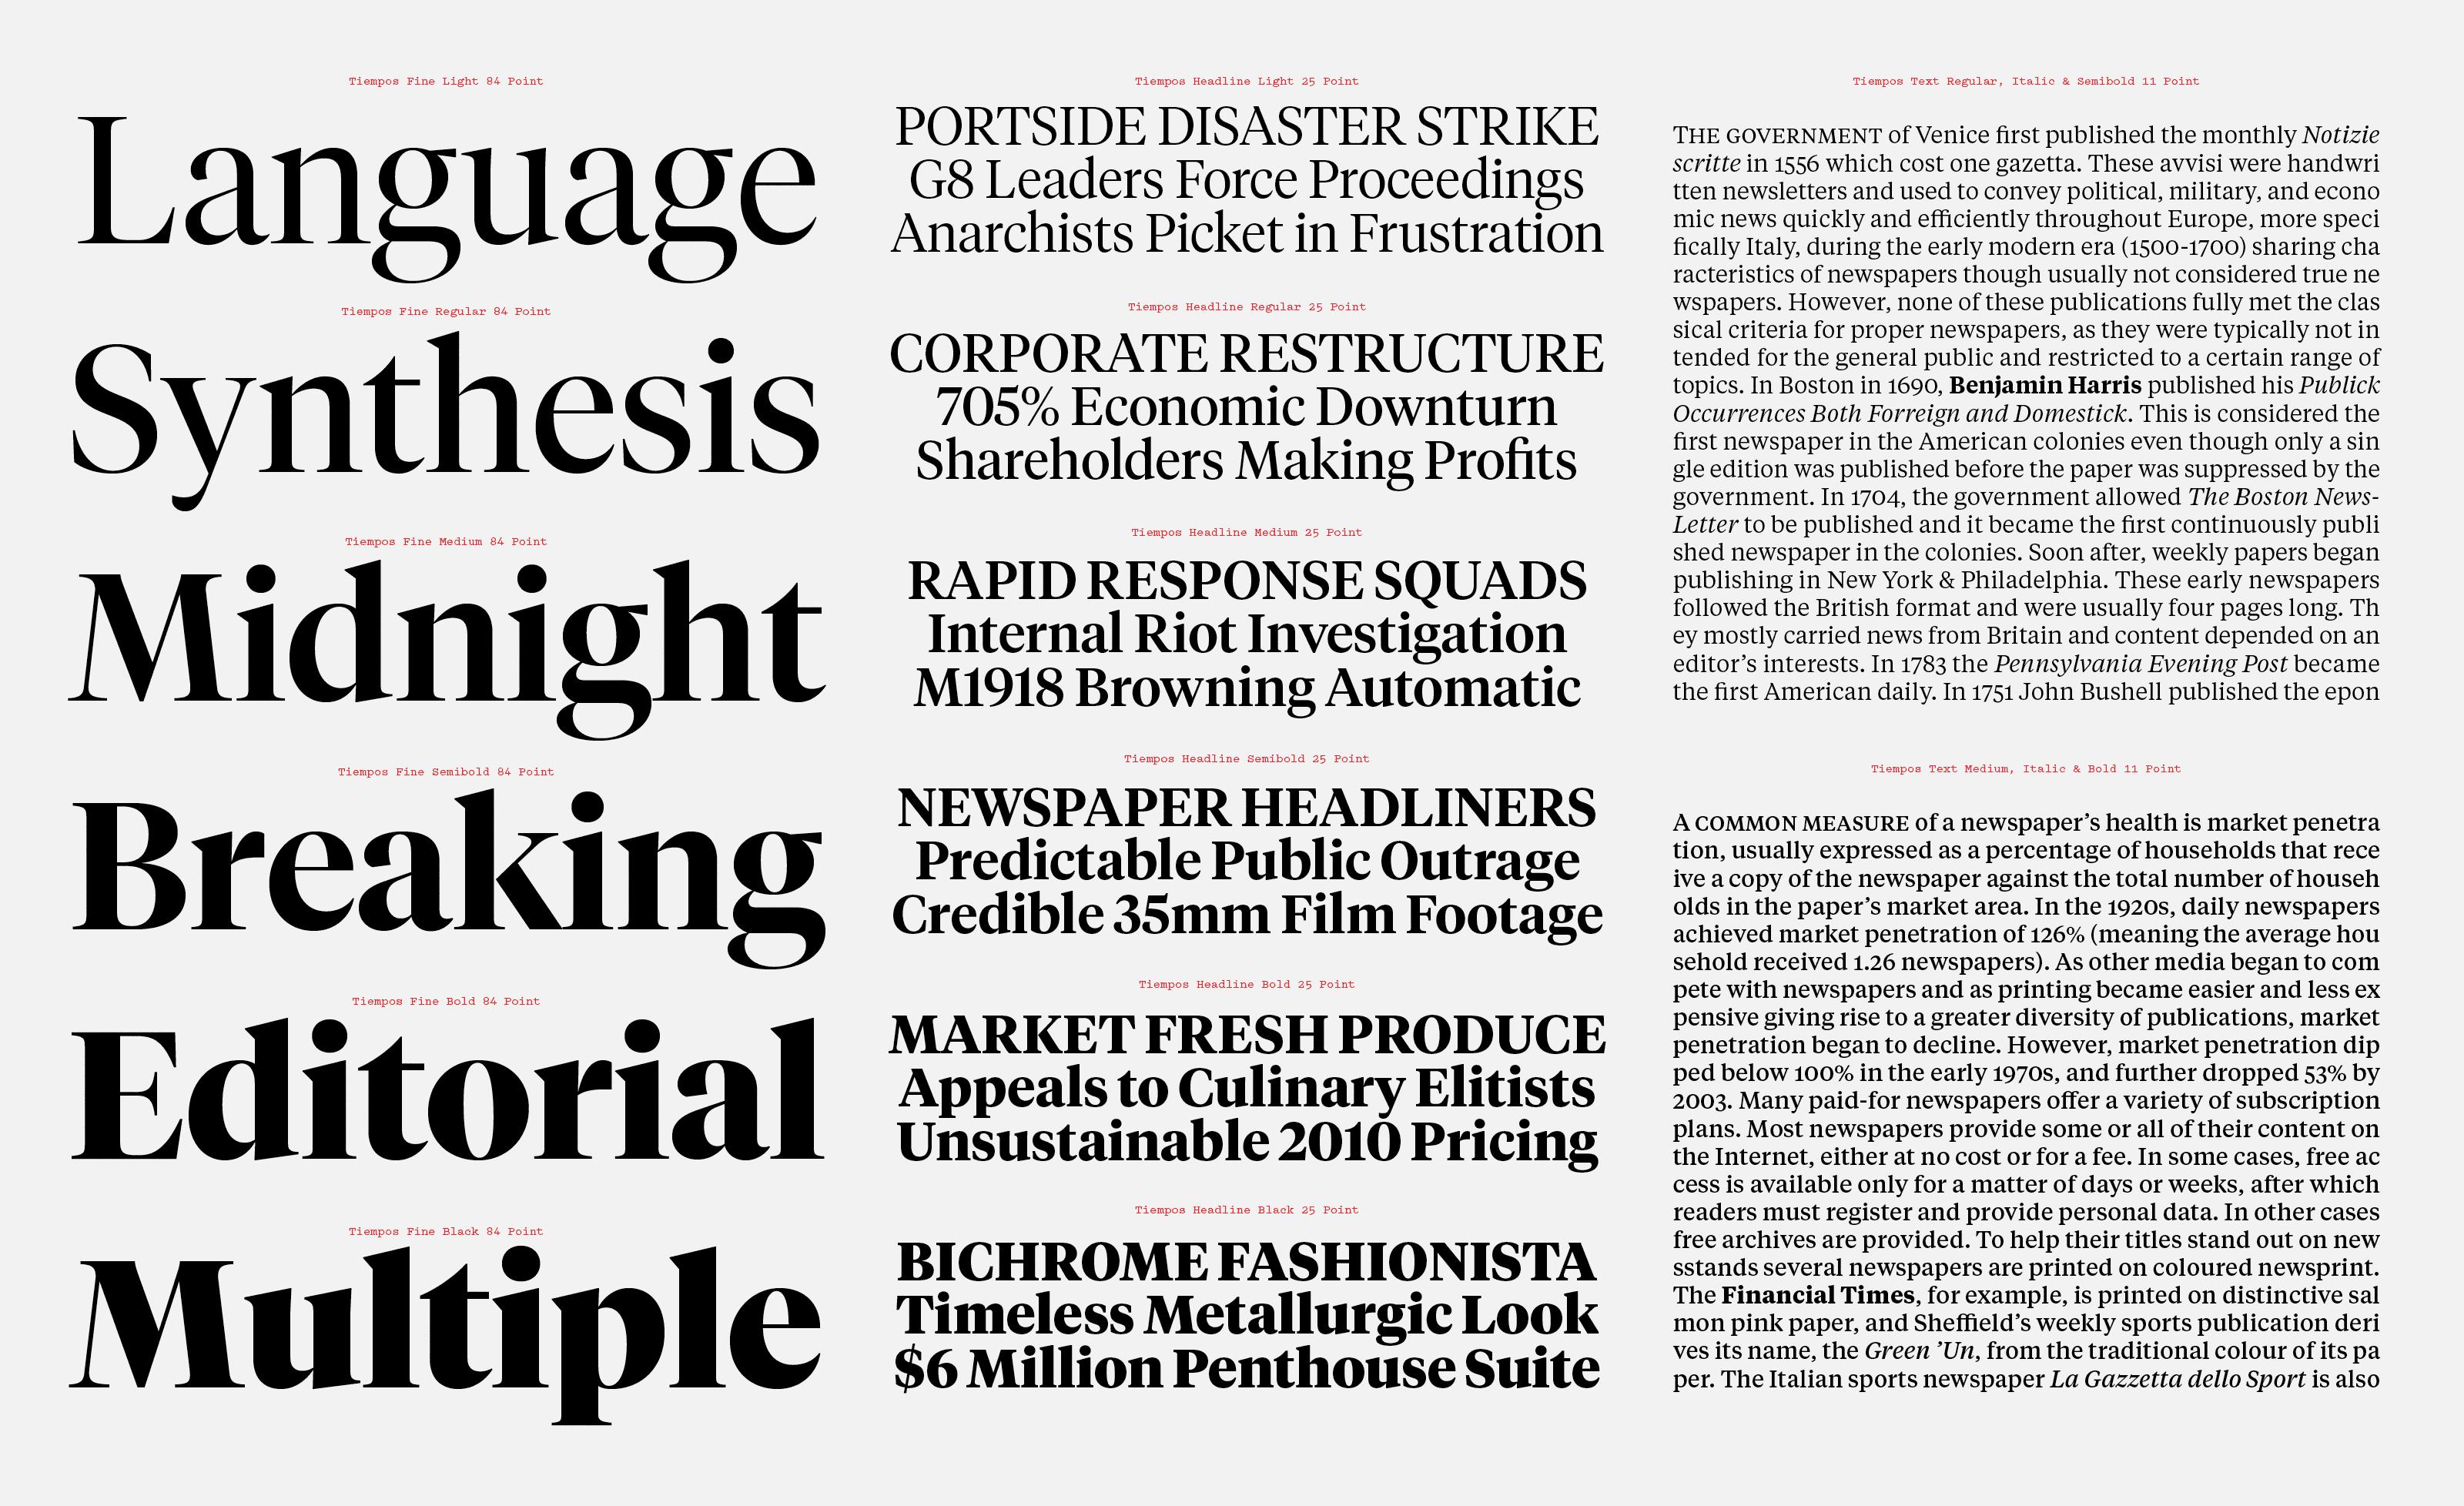 Village New Type Tiempos Fine Typographic Principles Typeface Typeface Design